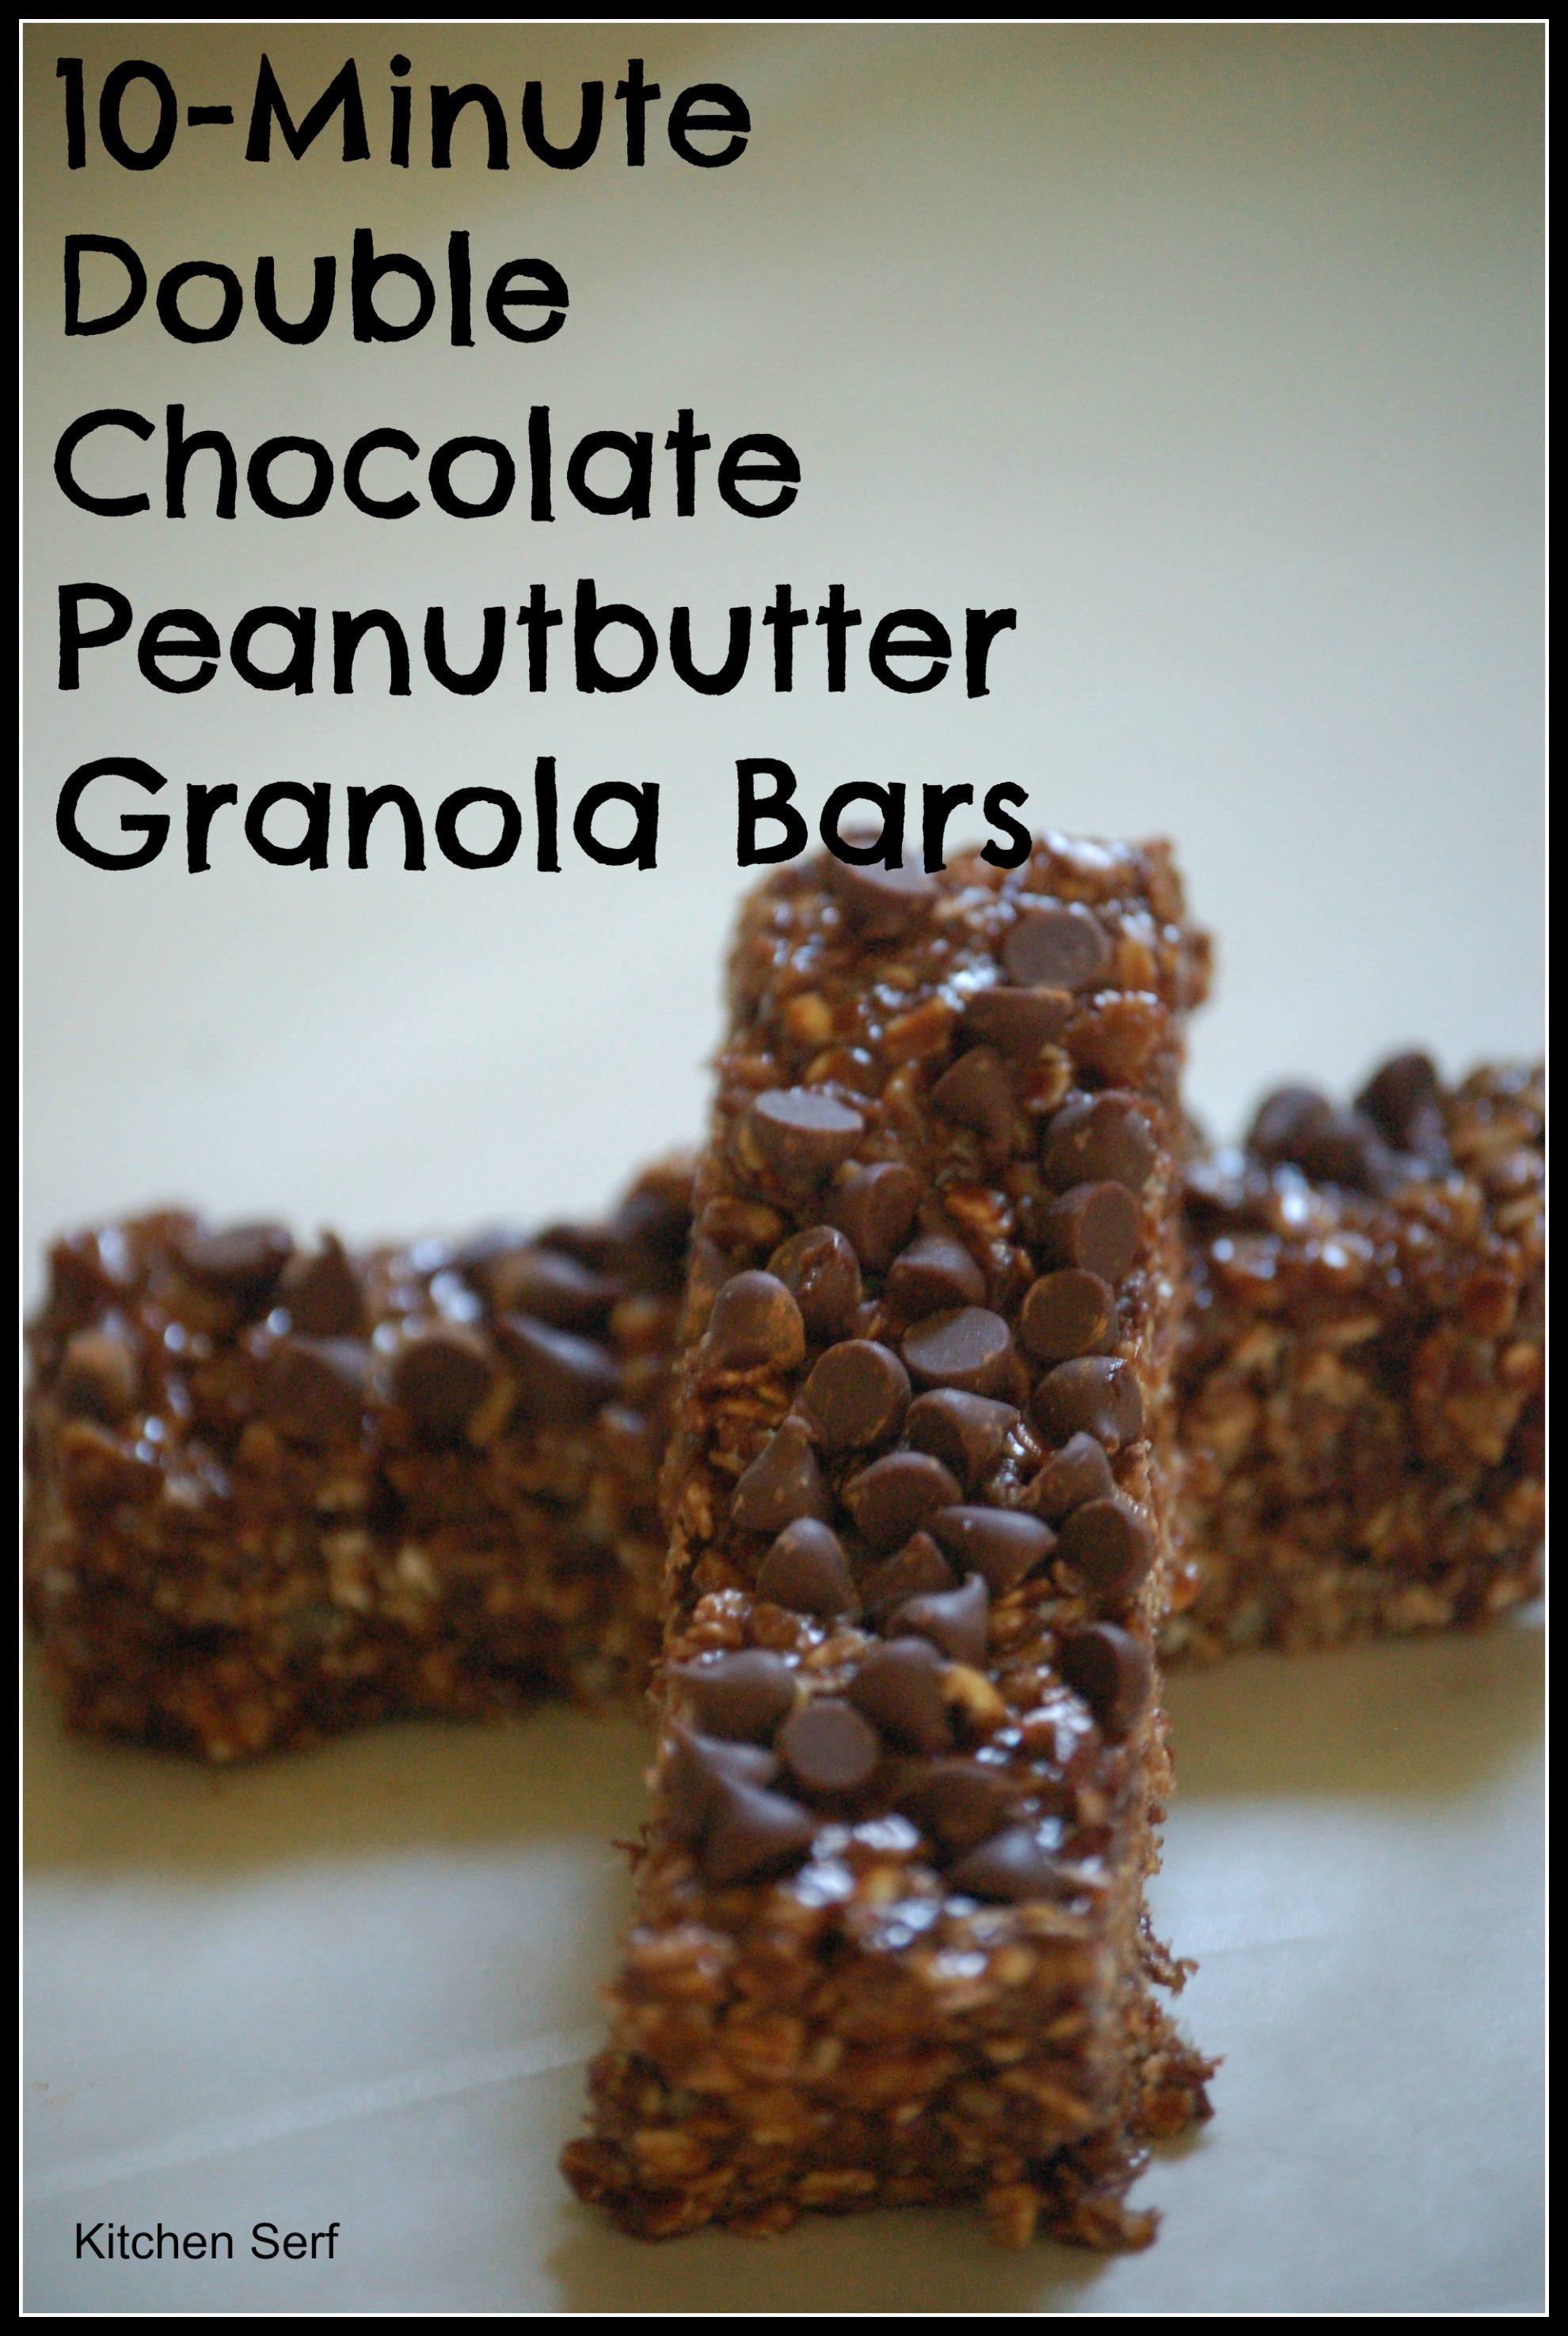 Ten-Minute Double Chocolate Peanutbutter Granola Bars